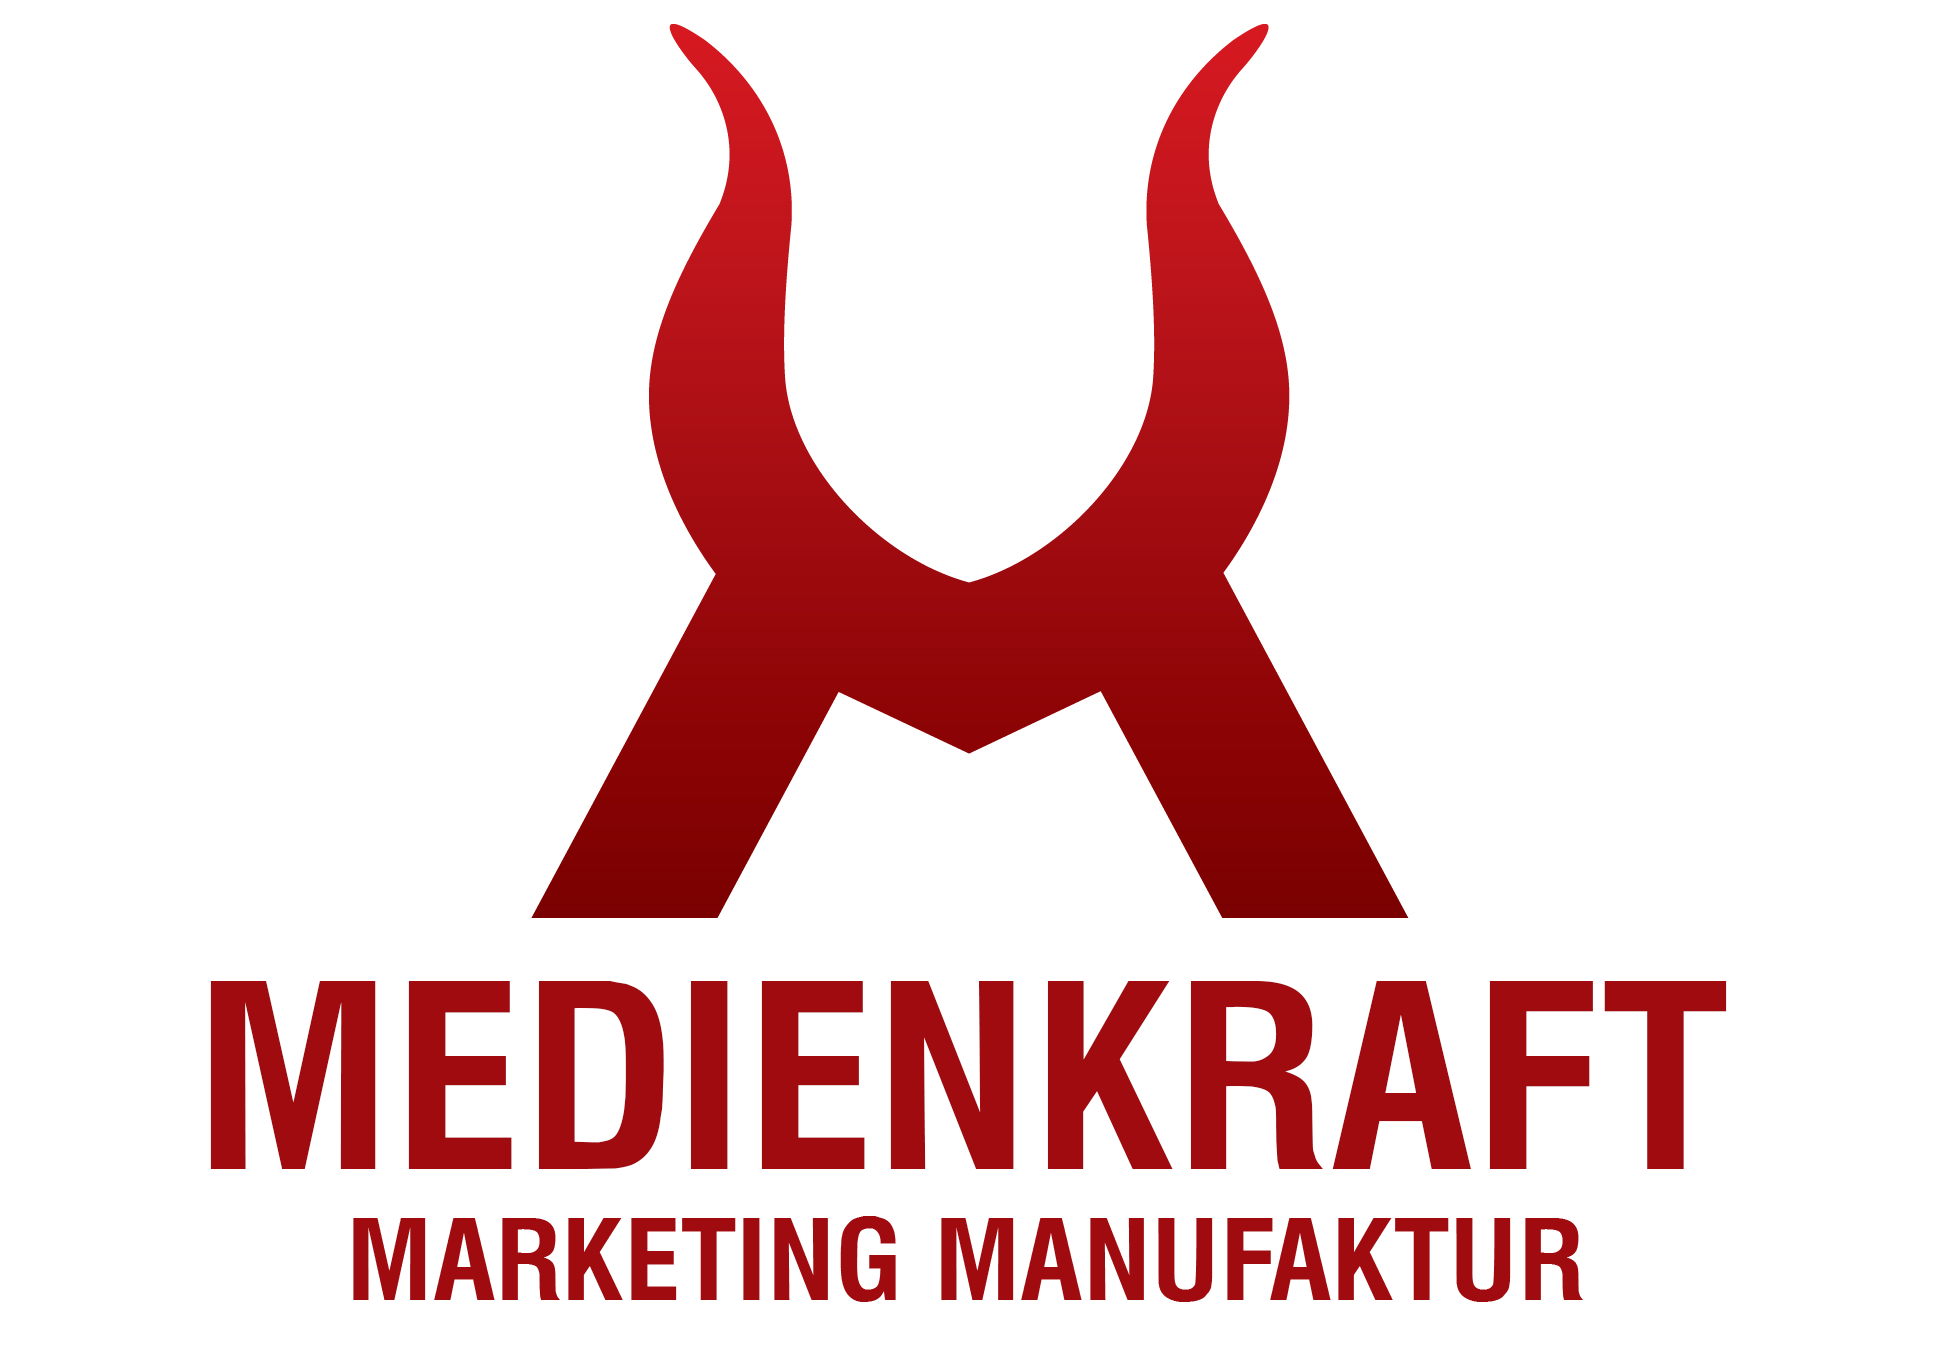 Medienkraft GmbH